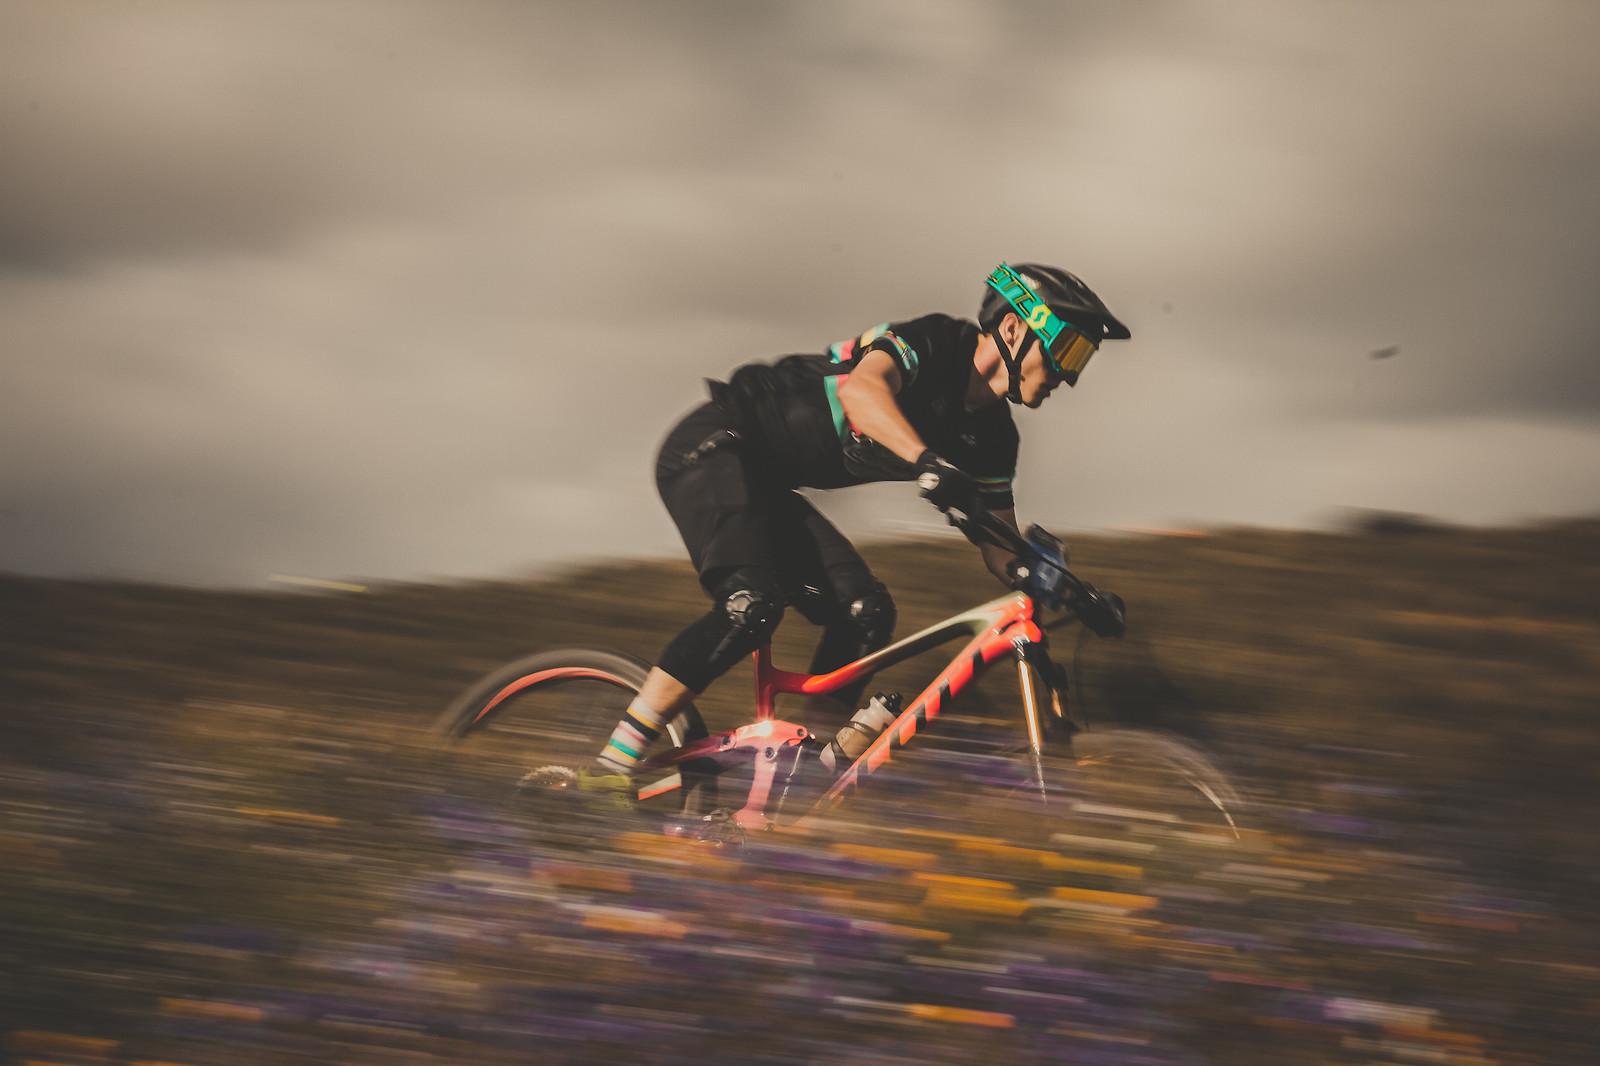 IMG 2070 - Liam Donohue - Mountain Biking Pictures - Vital MTB